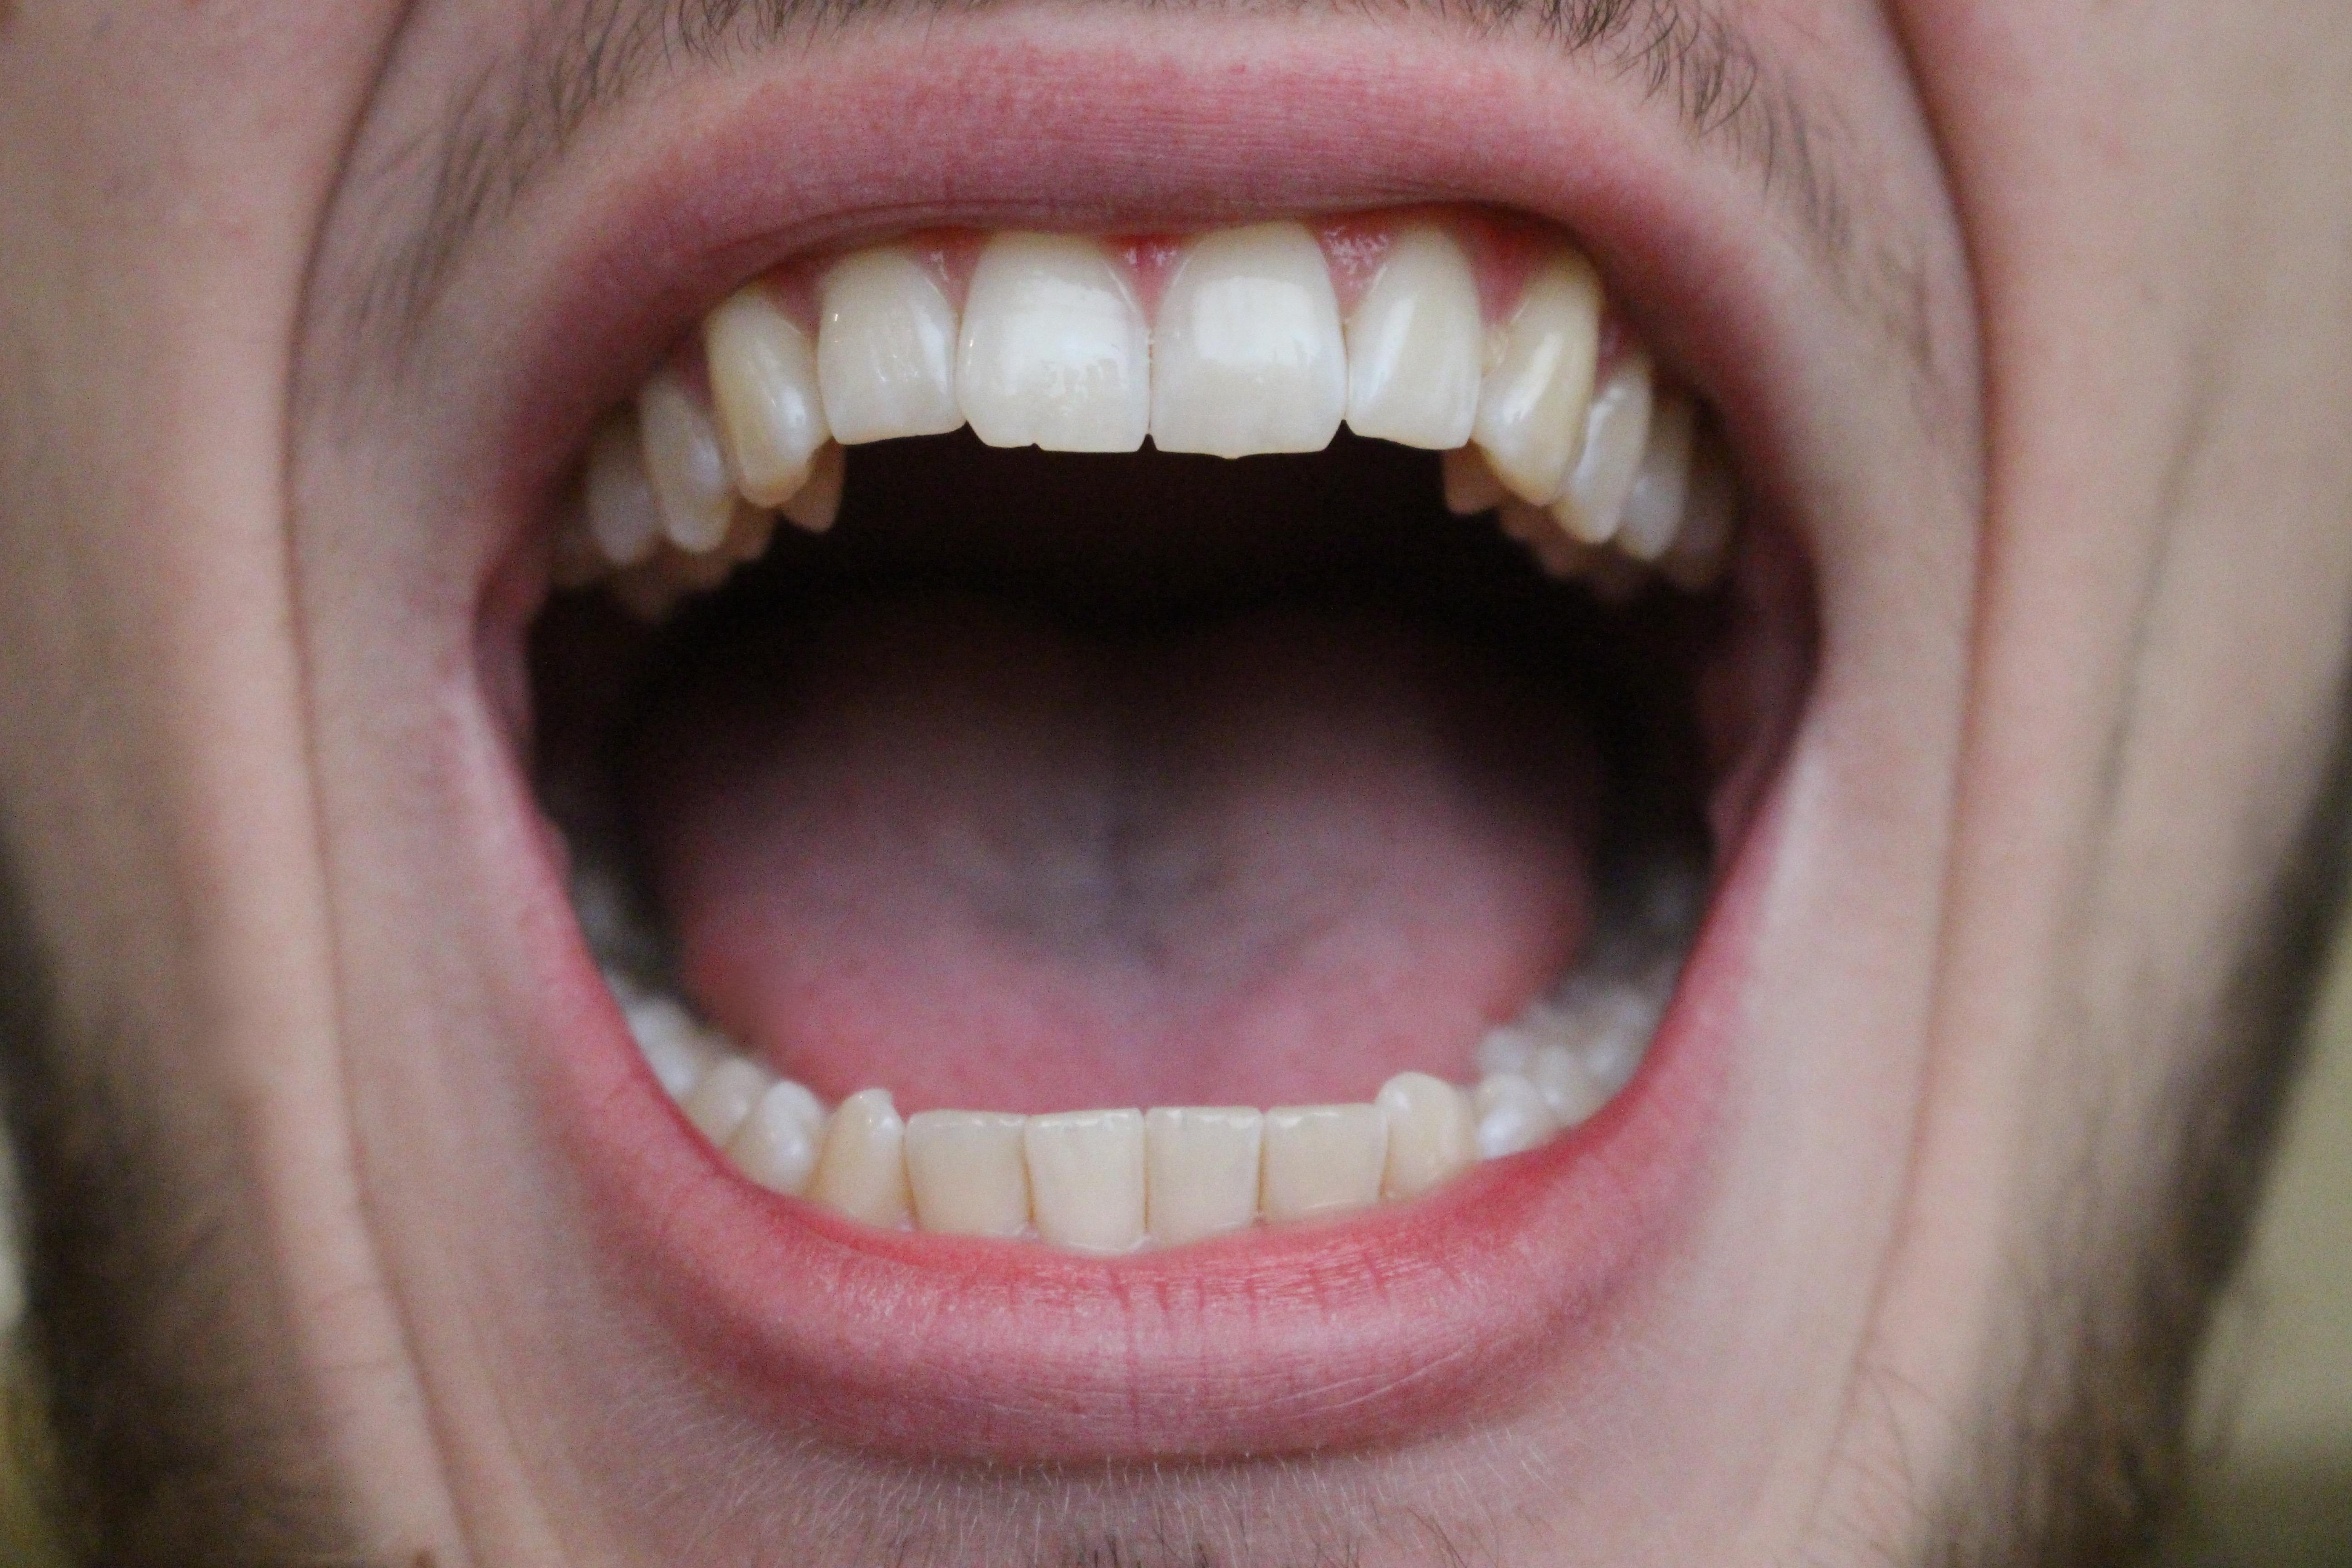 Free stock photo - Open Mouth - StockyPics